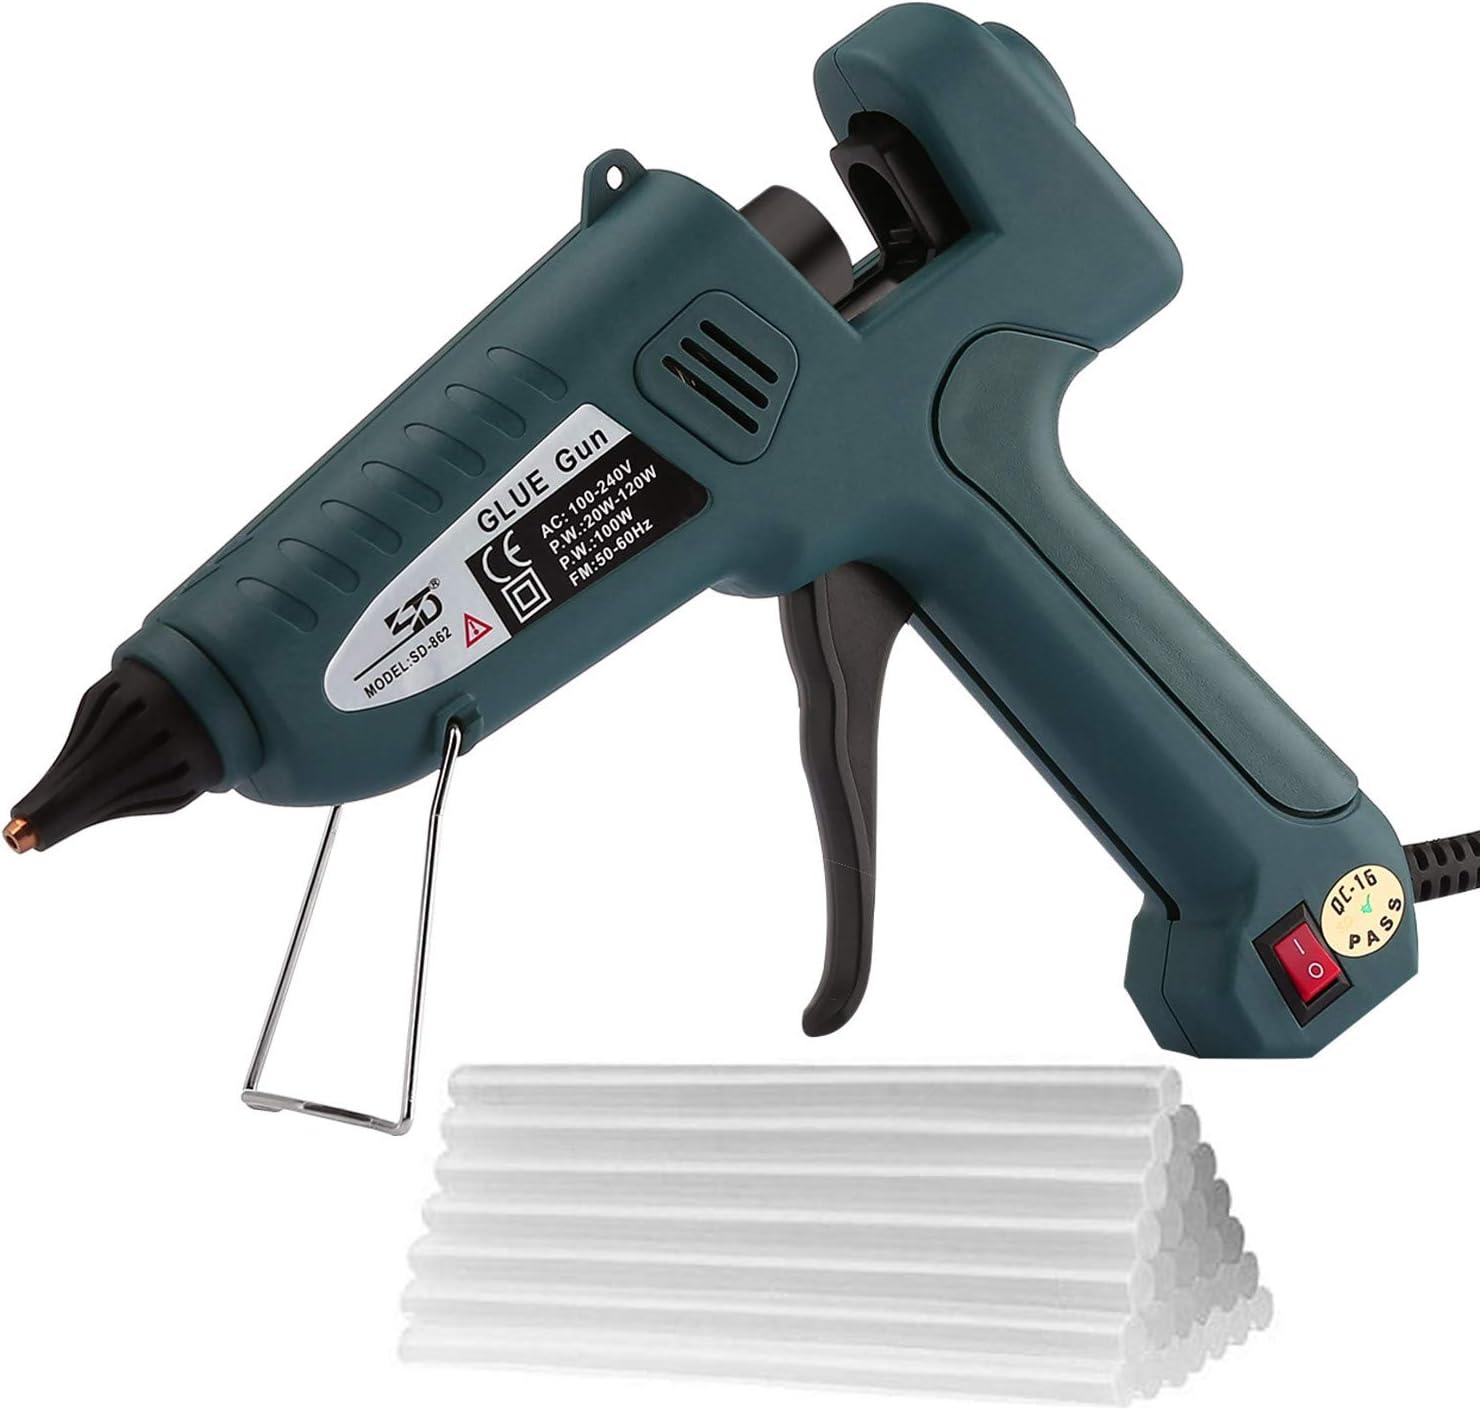 Stick it brand Glue Gun HOT MELT